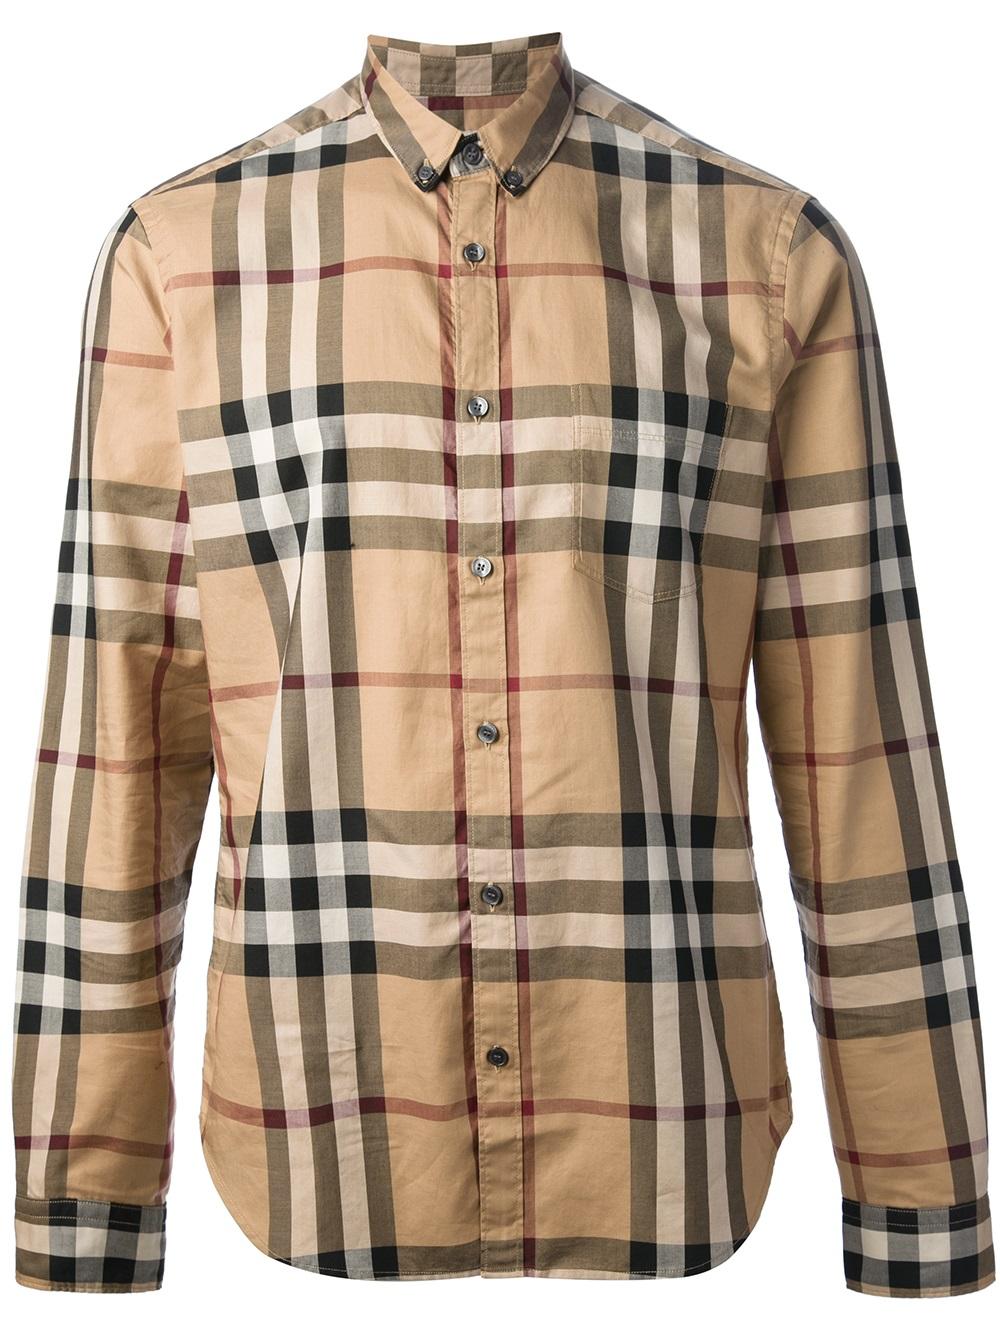 burberry shirt australia